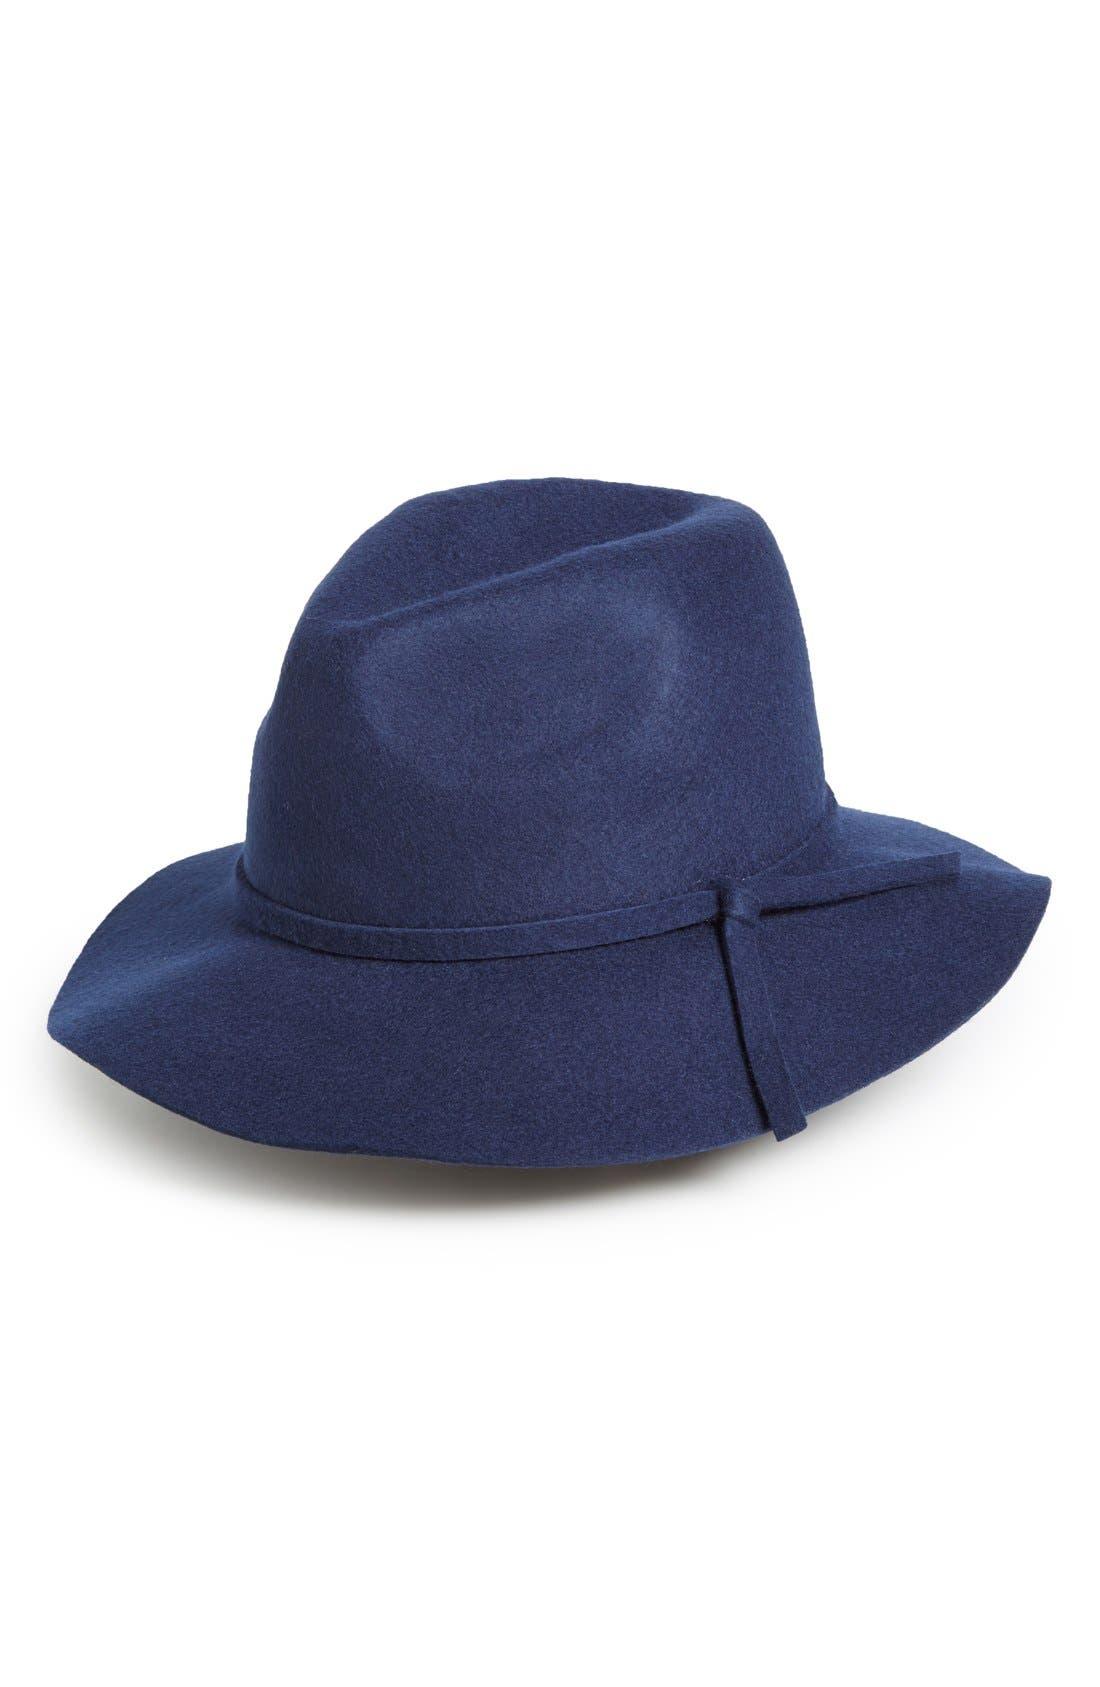 Main Image - Emanuel GeraldoKnot Band Wool Felt Panama Hat